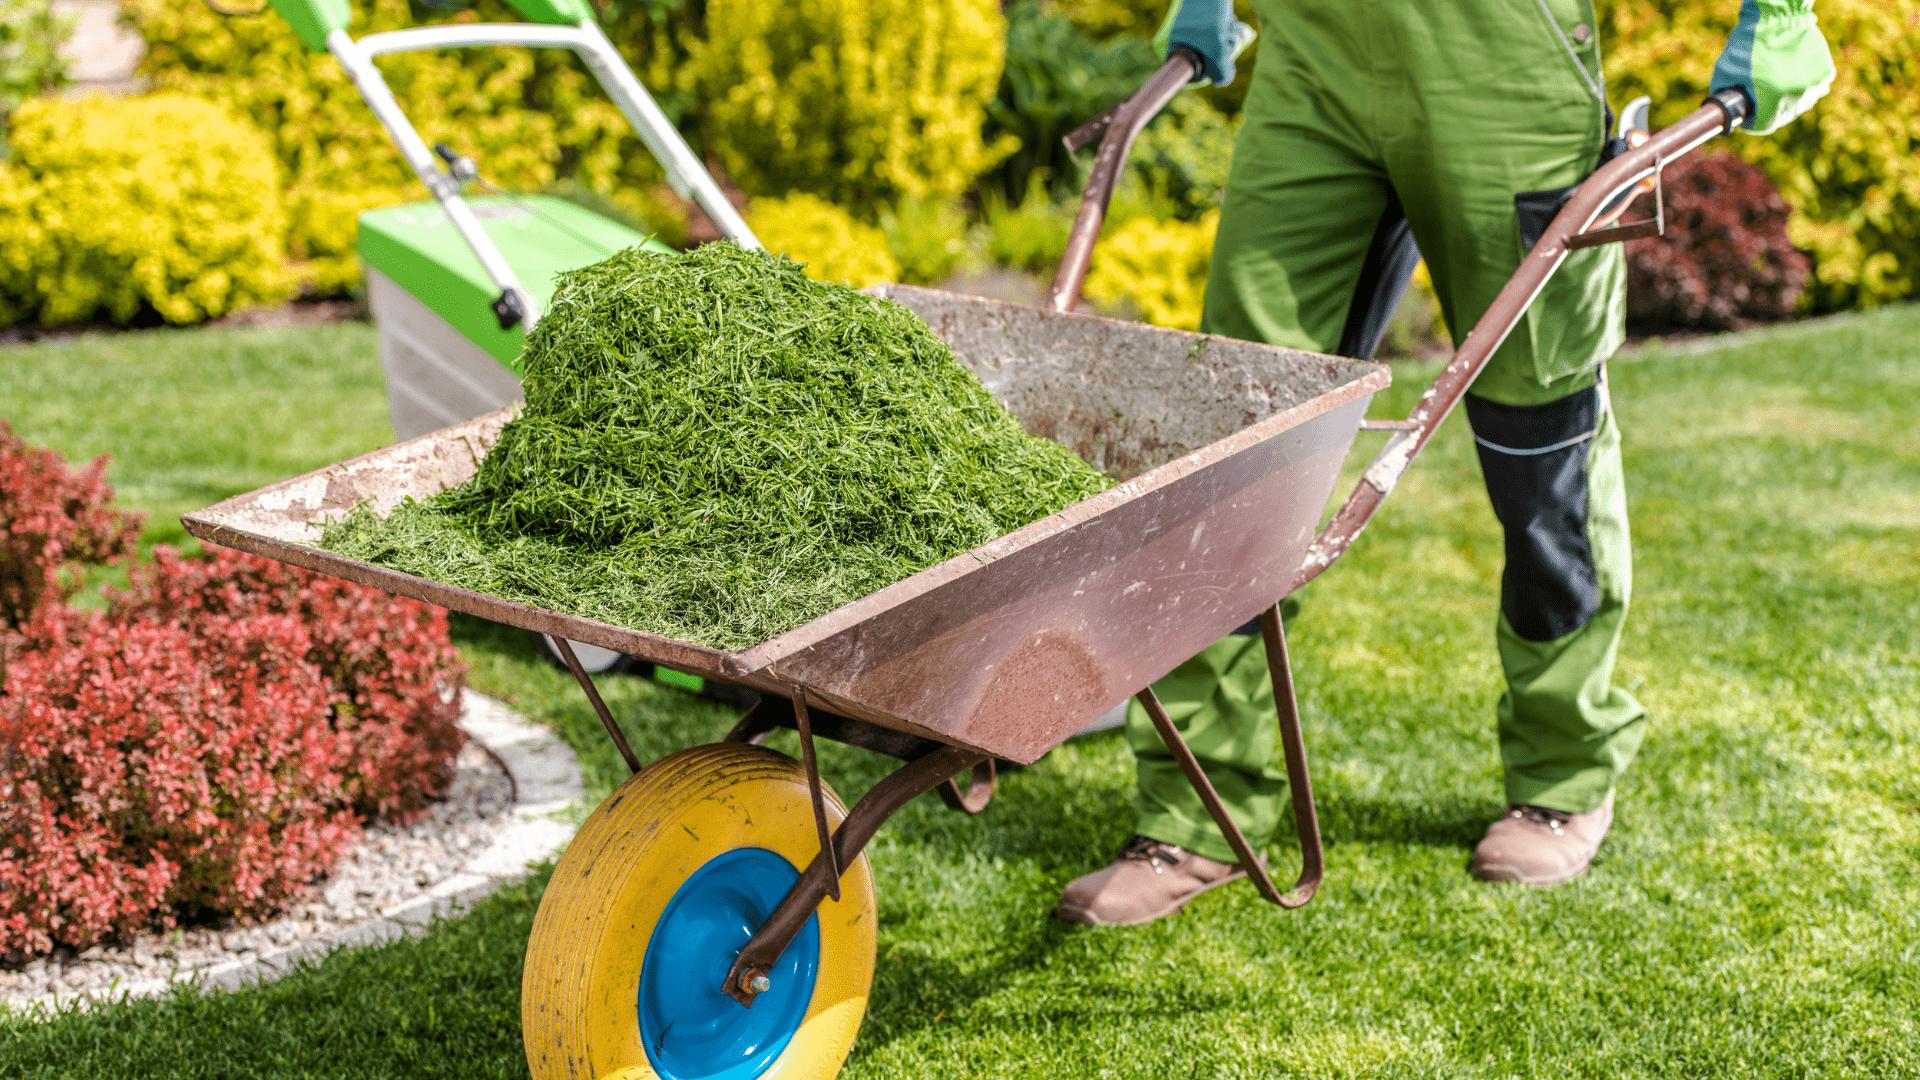 servizio giardinieri garbagnate milanese